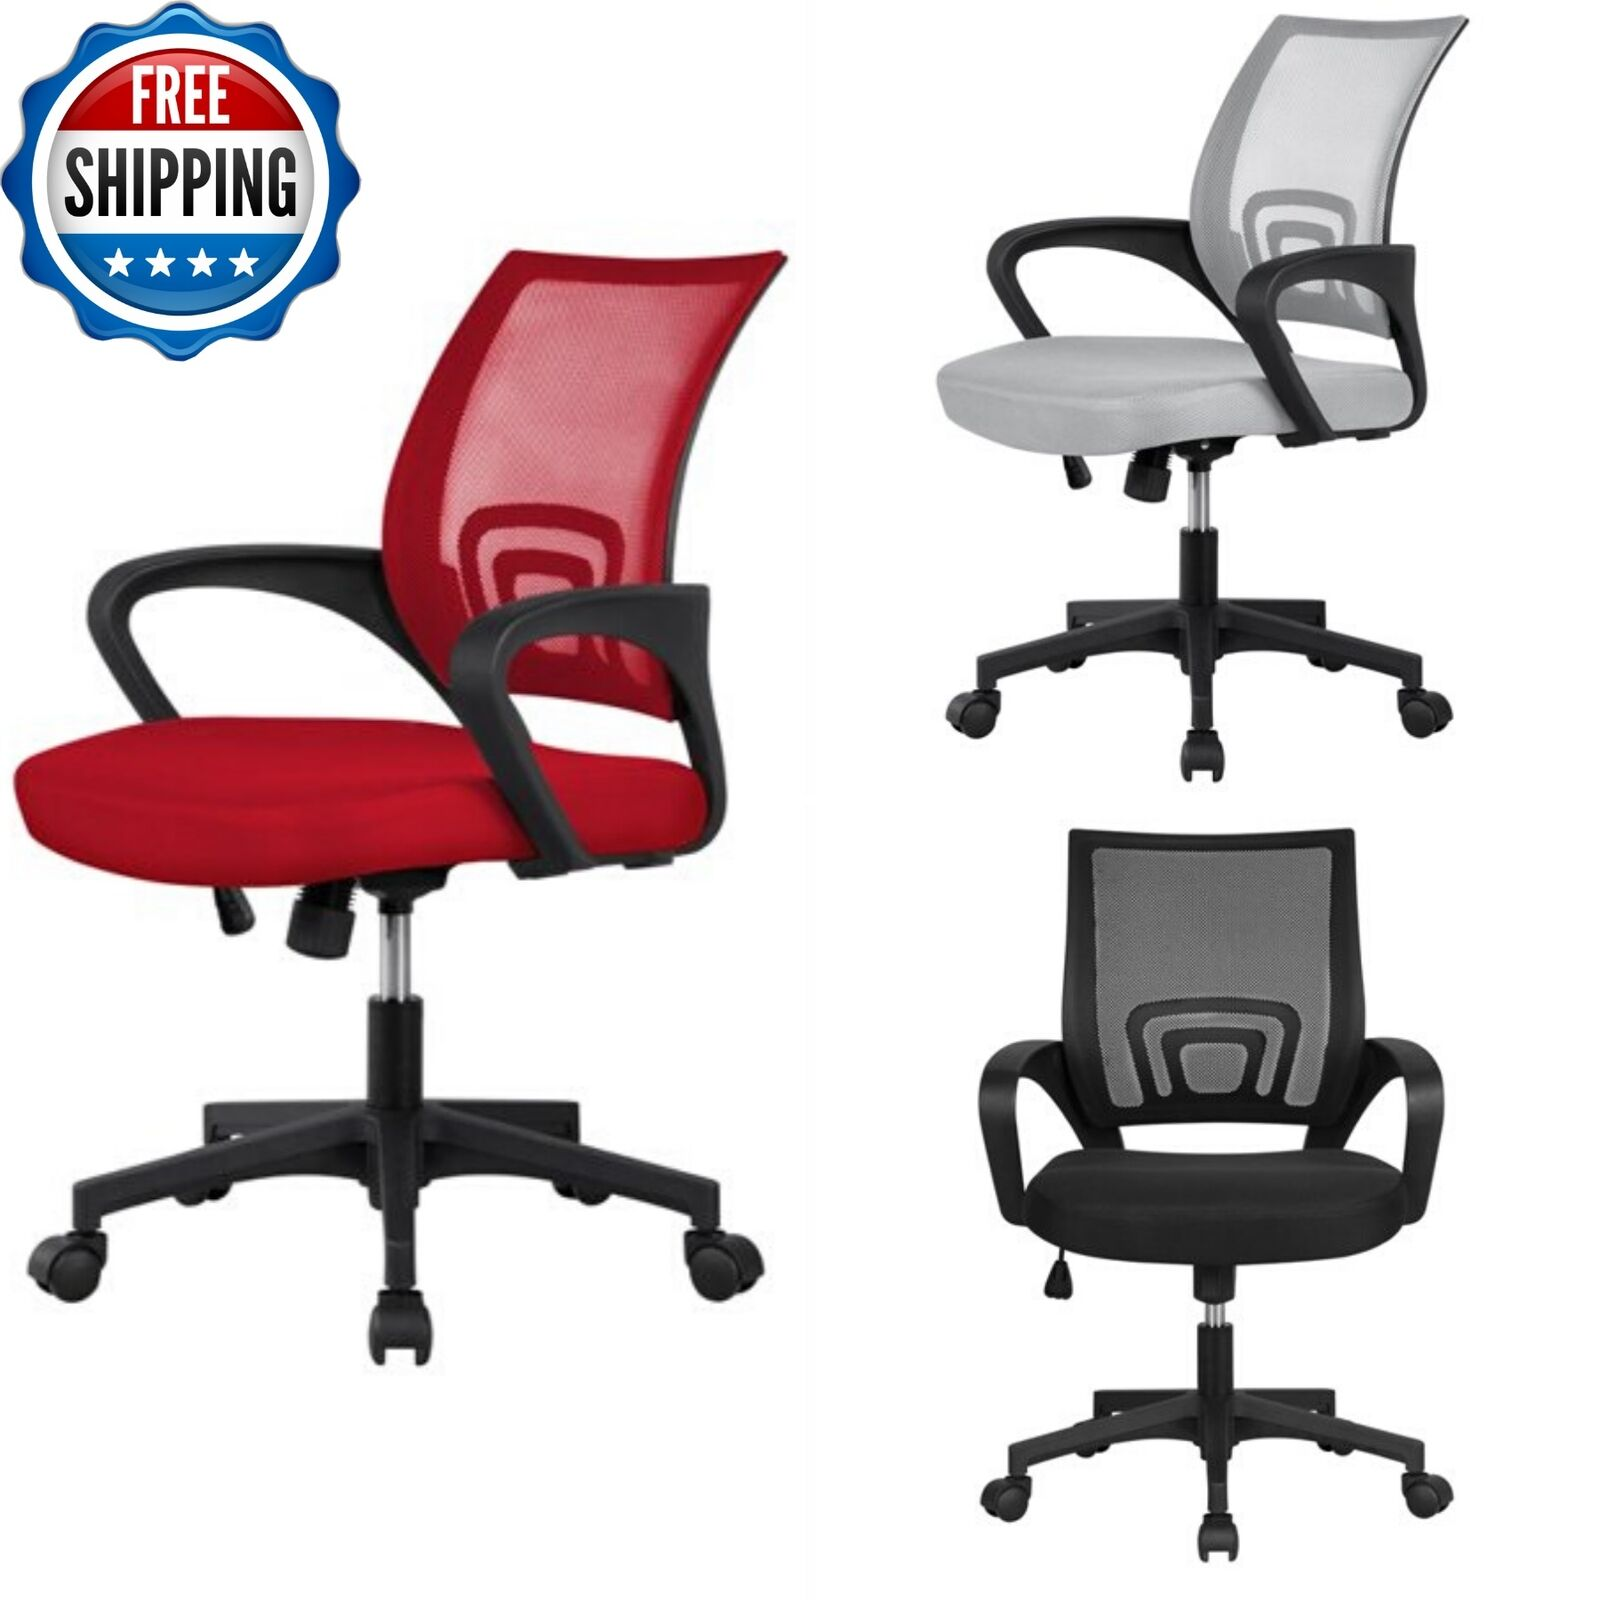 - Adjustable Mesh Office Chair Ergonomic Rolling Swivel Computer